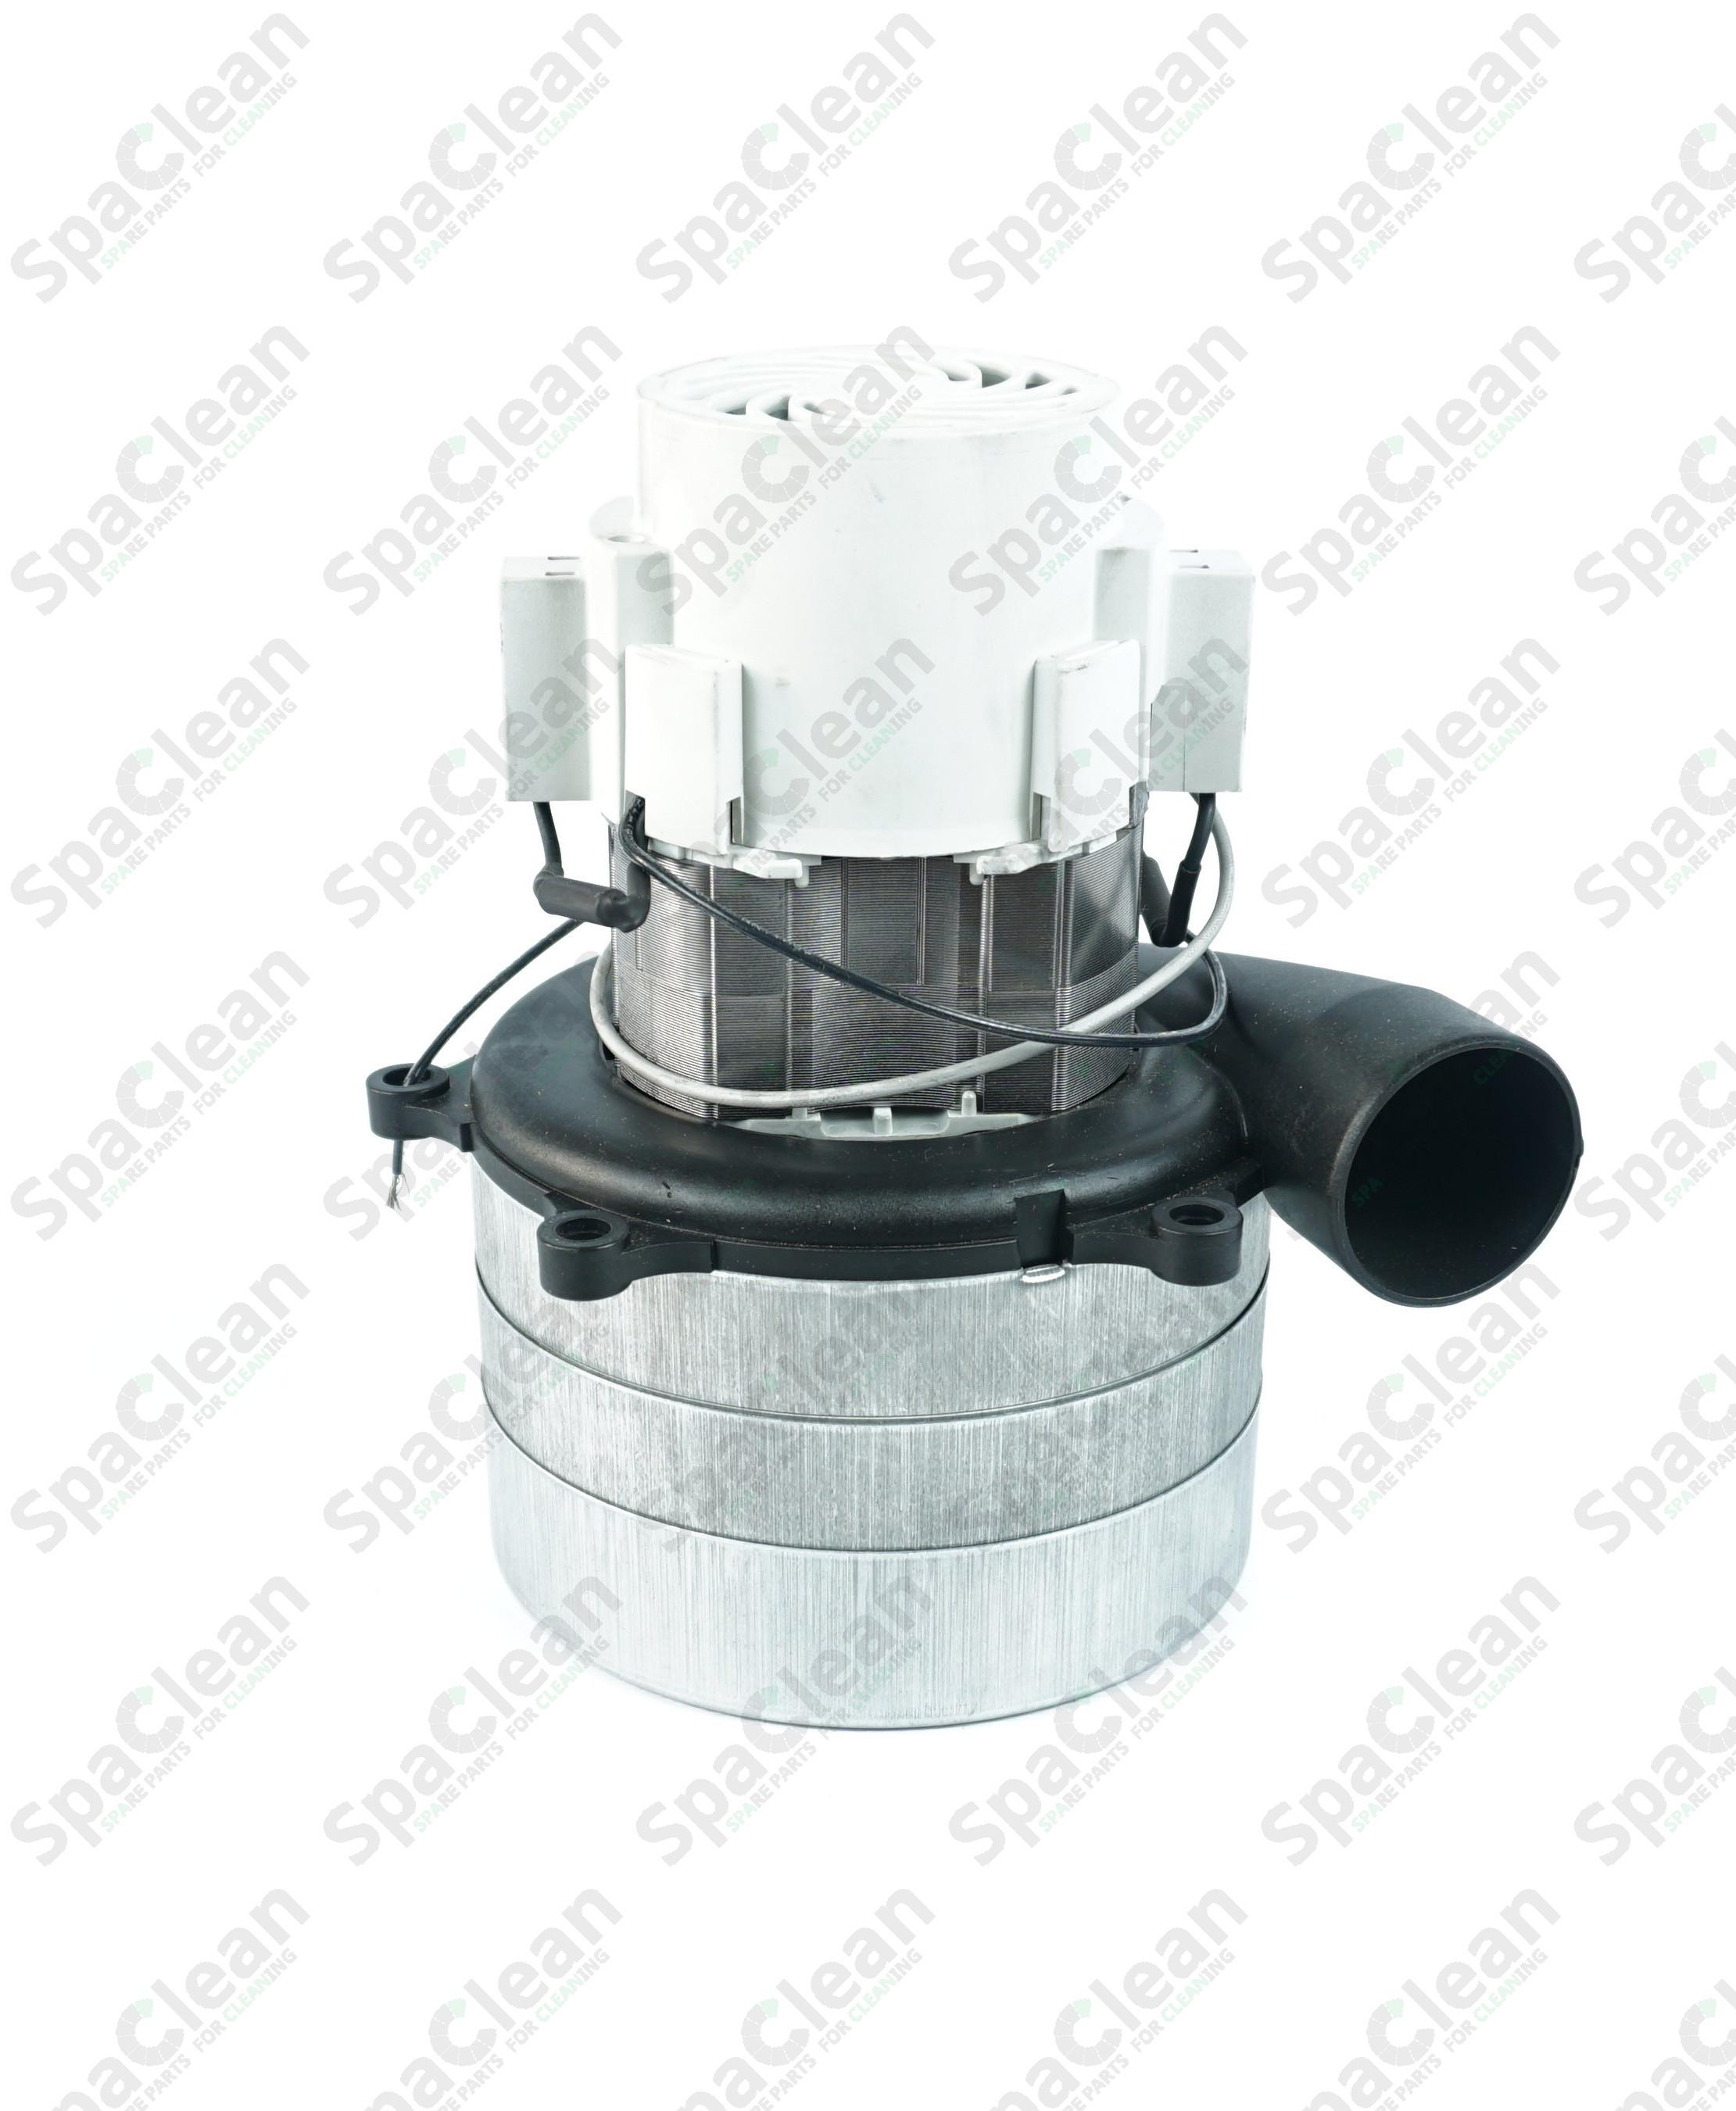 Вакуумный мотор Synclean 230V 1300W Трехстадийный